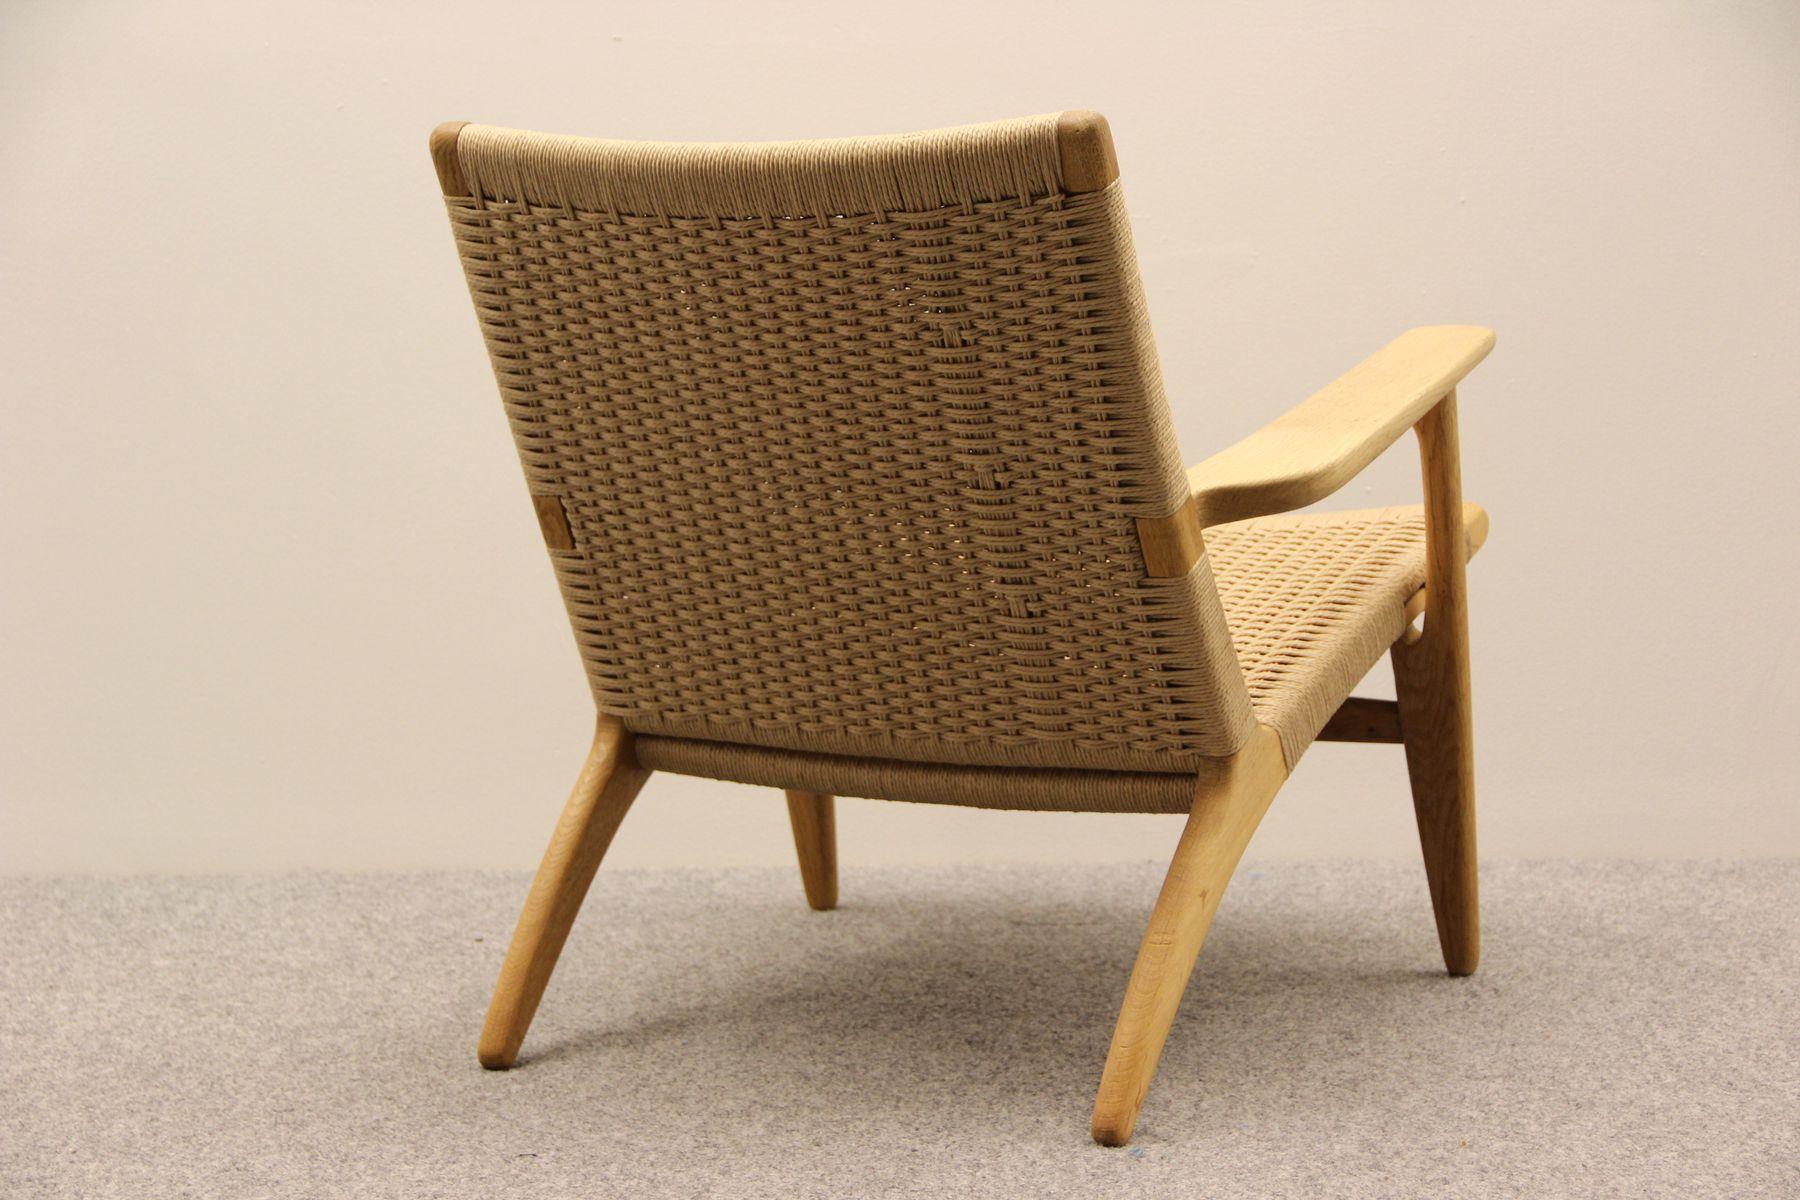 ch25 easy chair by hans j wegner for carl hansen 1950s. Black Bedroom Furniture Sets. Home Design Ideas